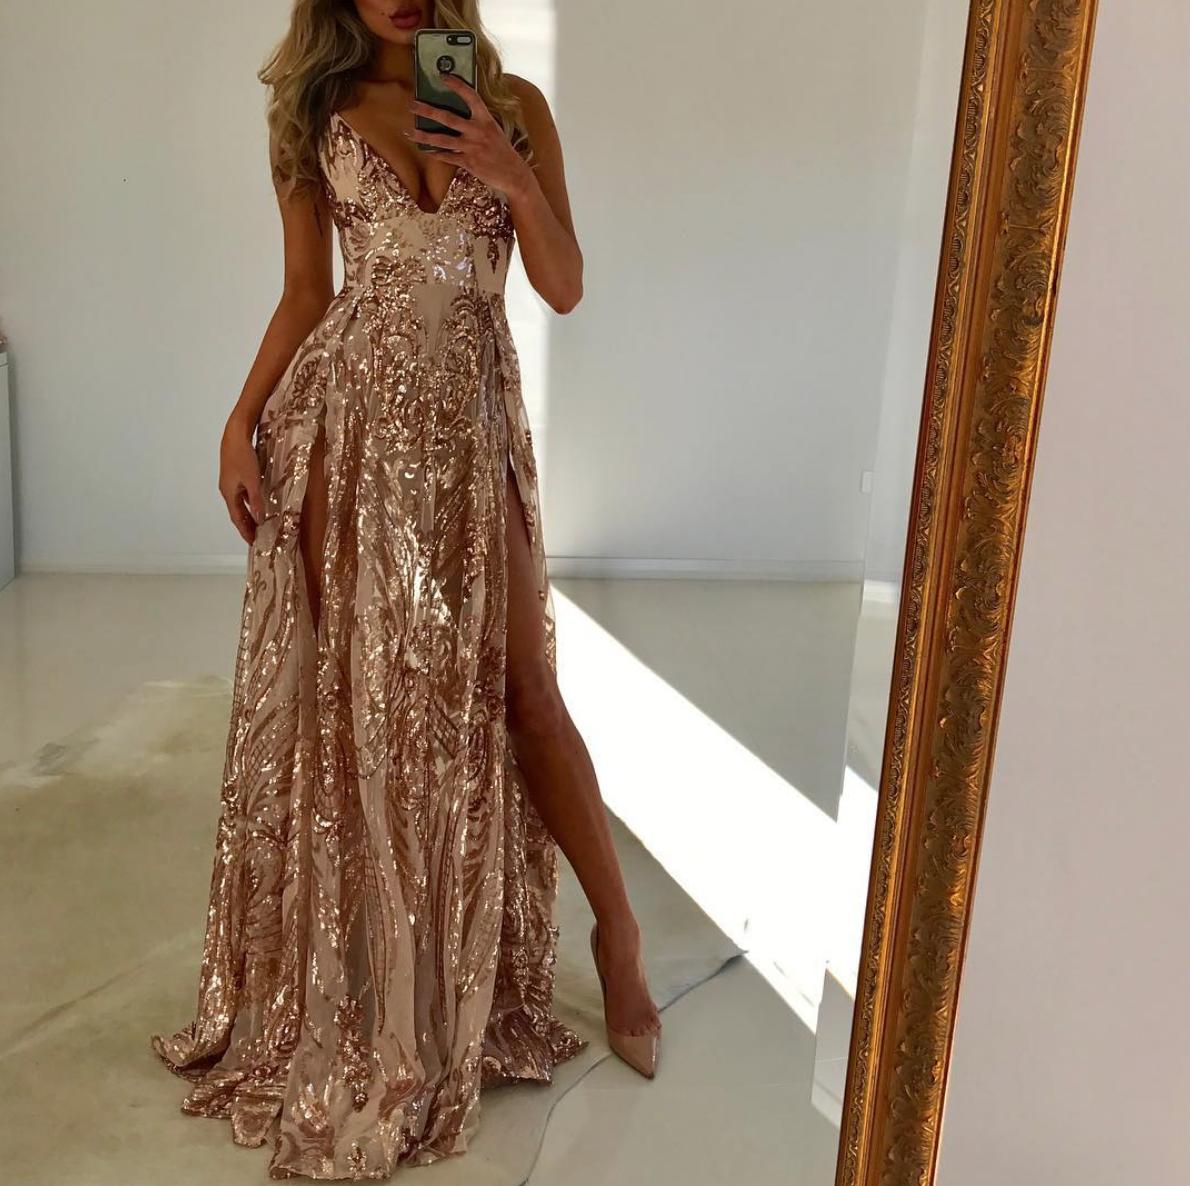 The Artistry Dress Evening Gown Formal Dress Prom Dress Maxi